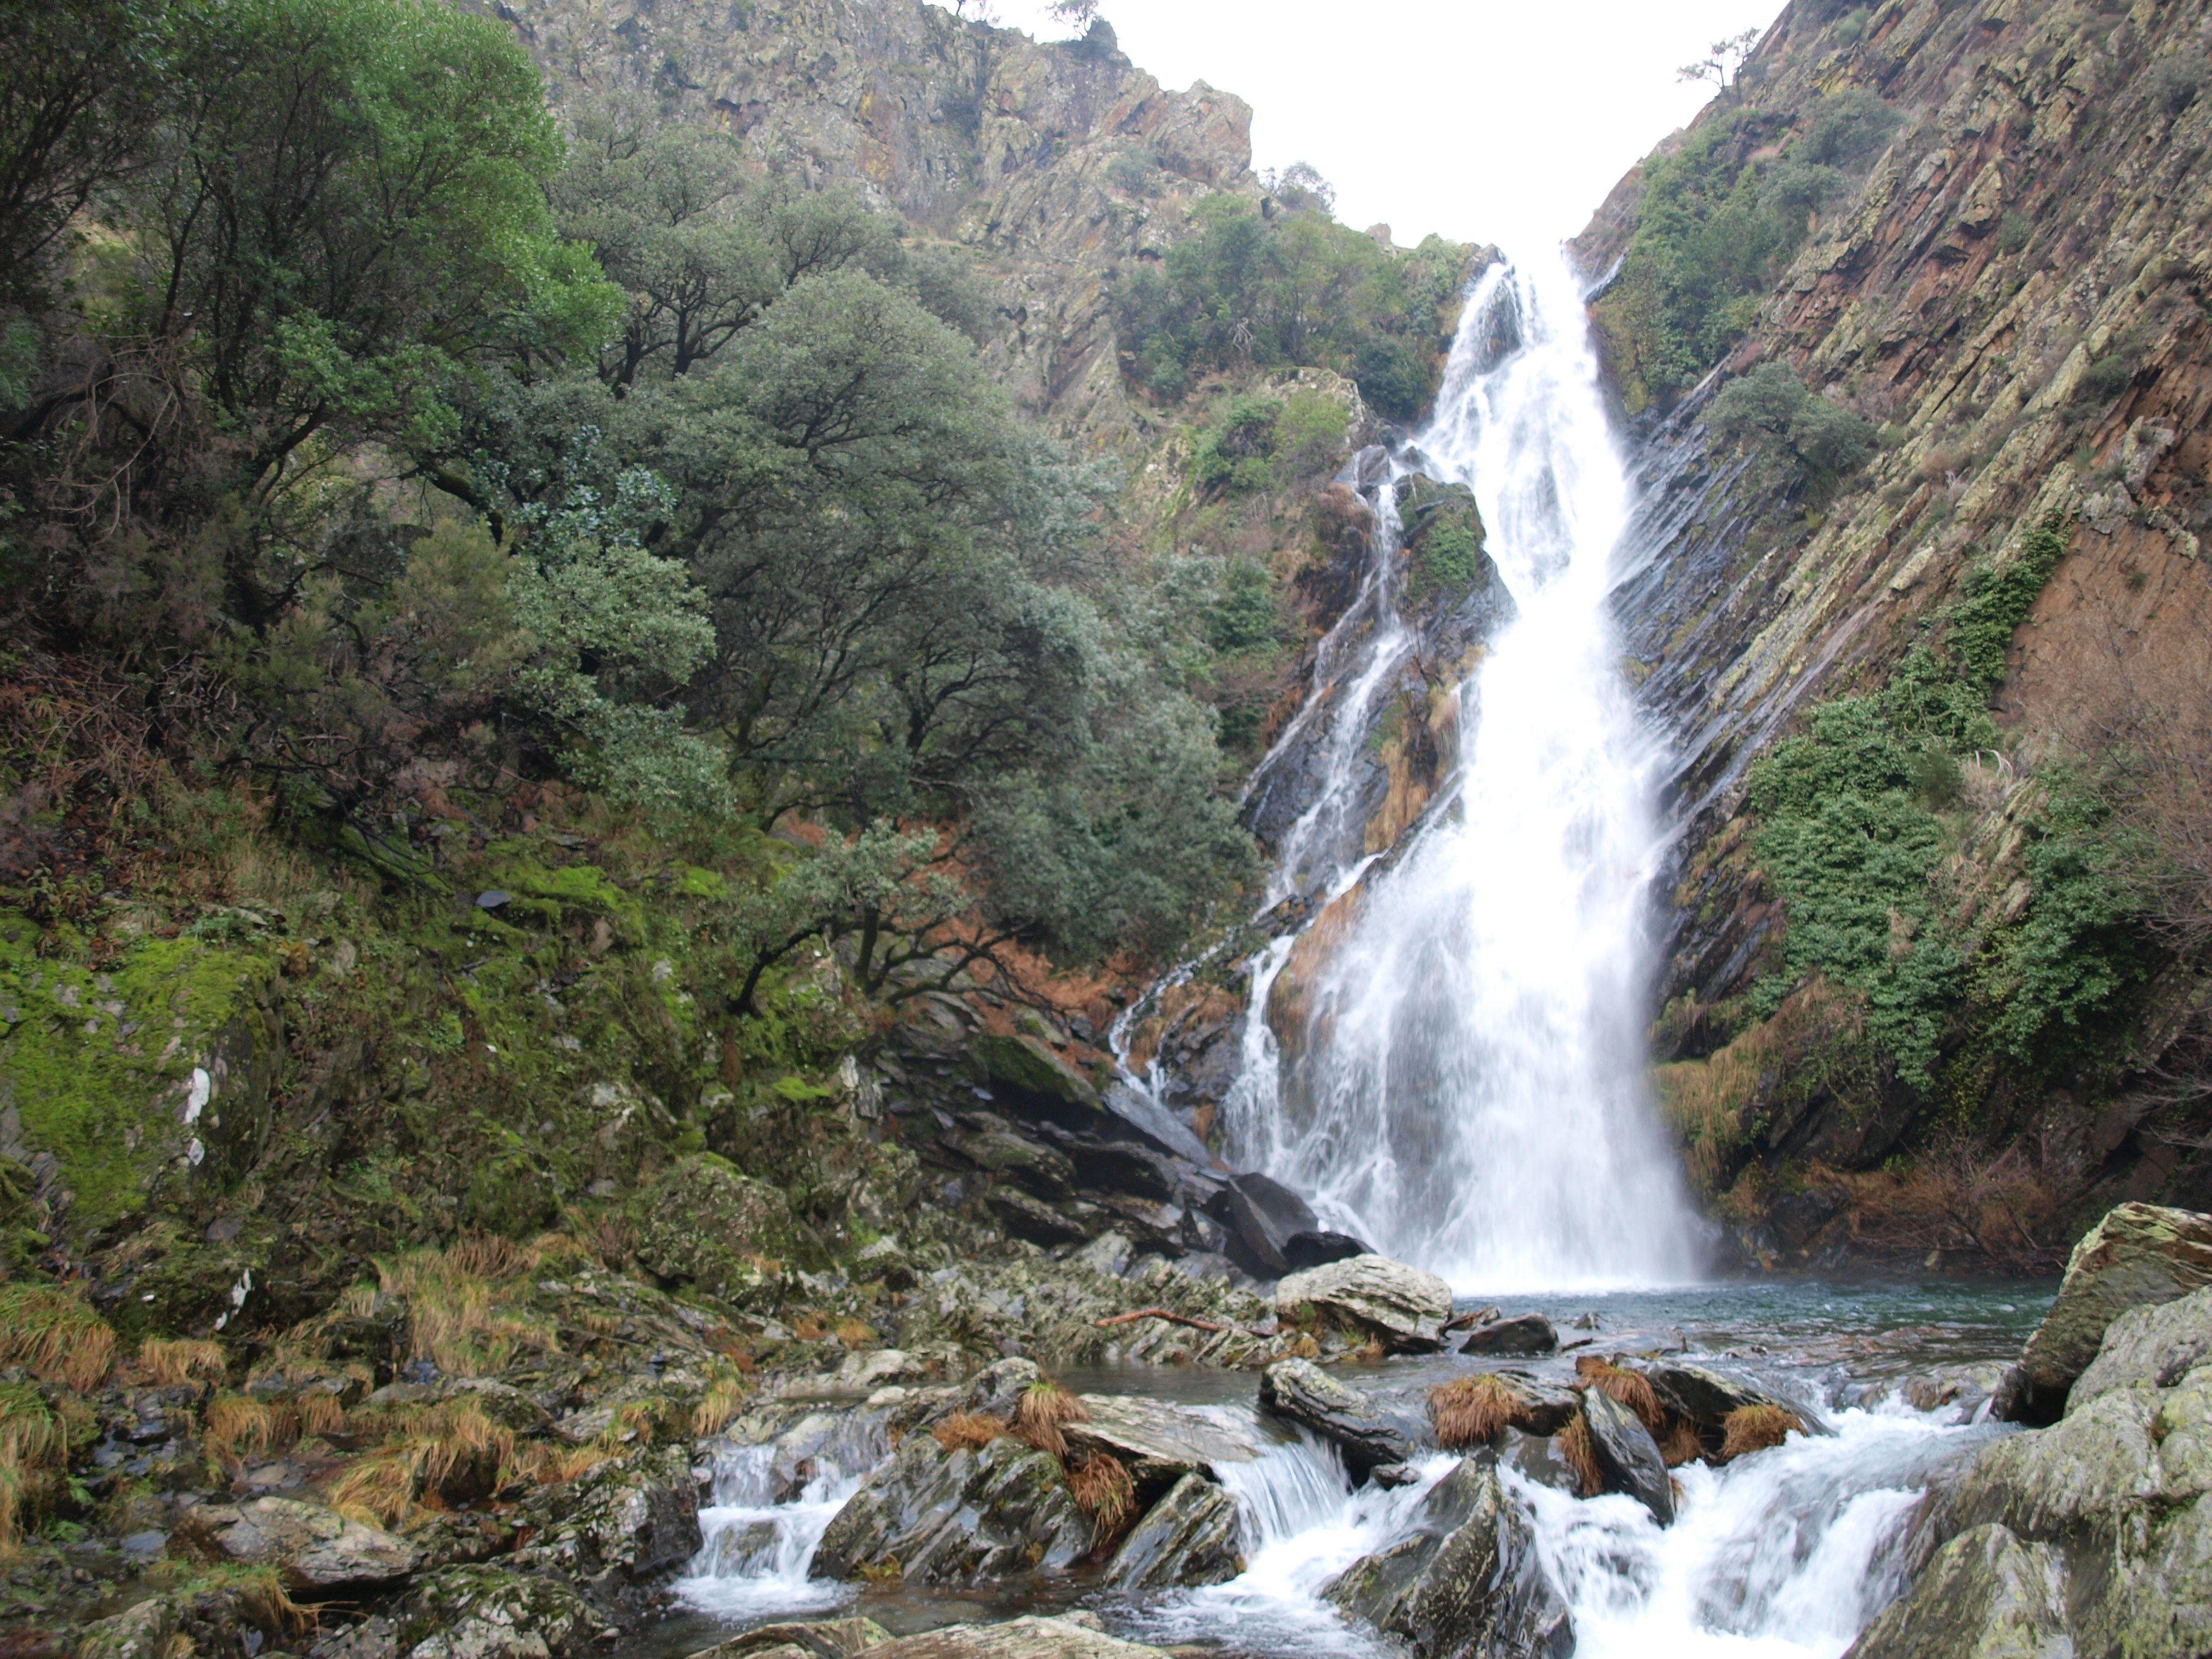 Resultado de imagen de Cascada del Chorrituelo